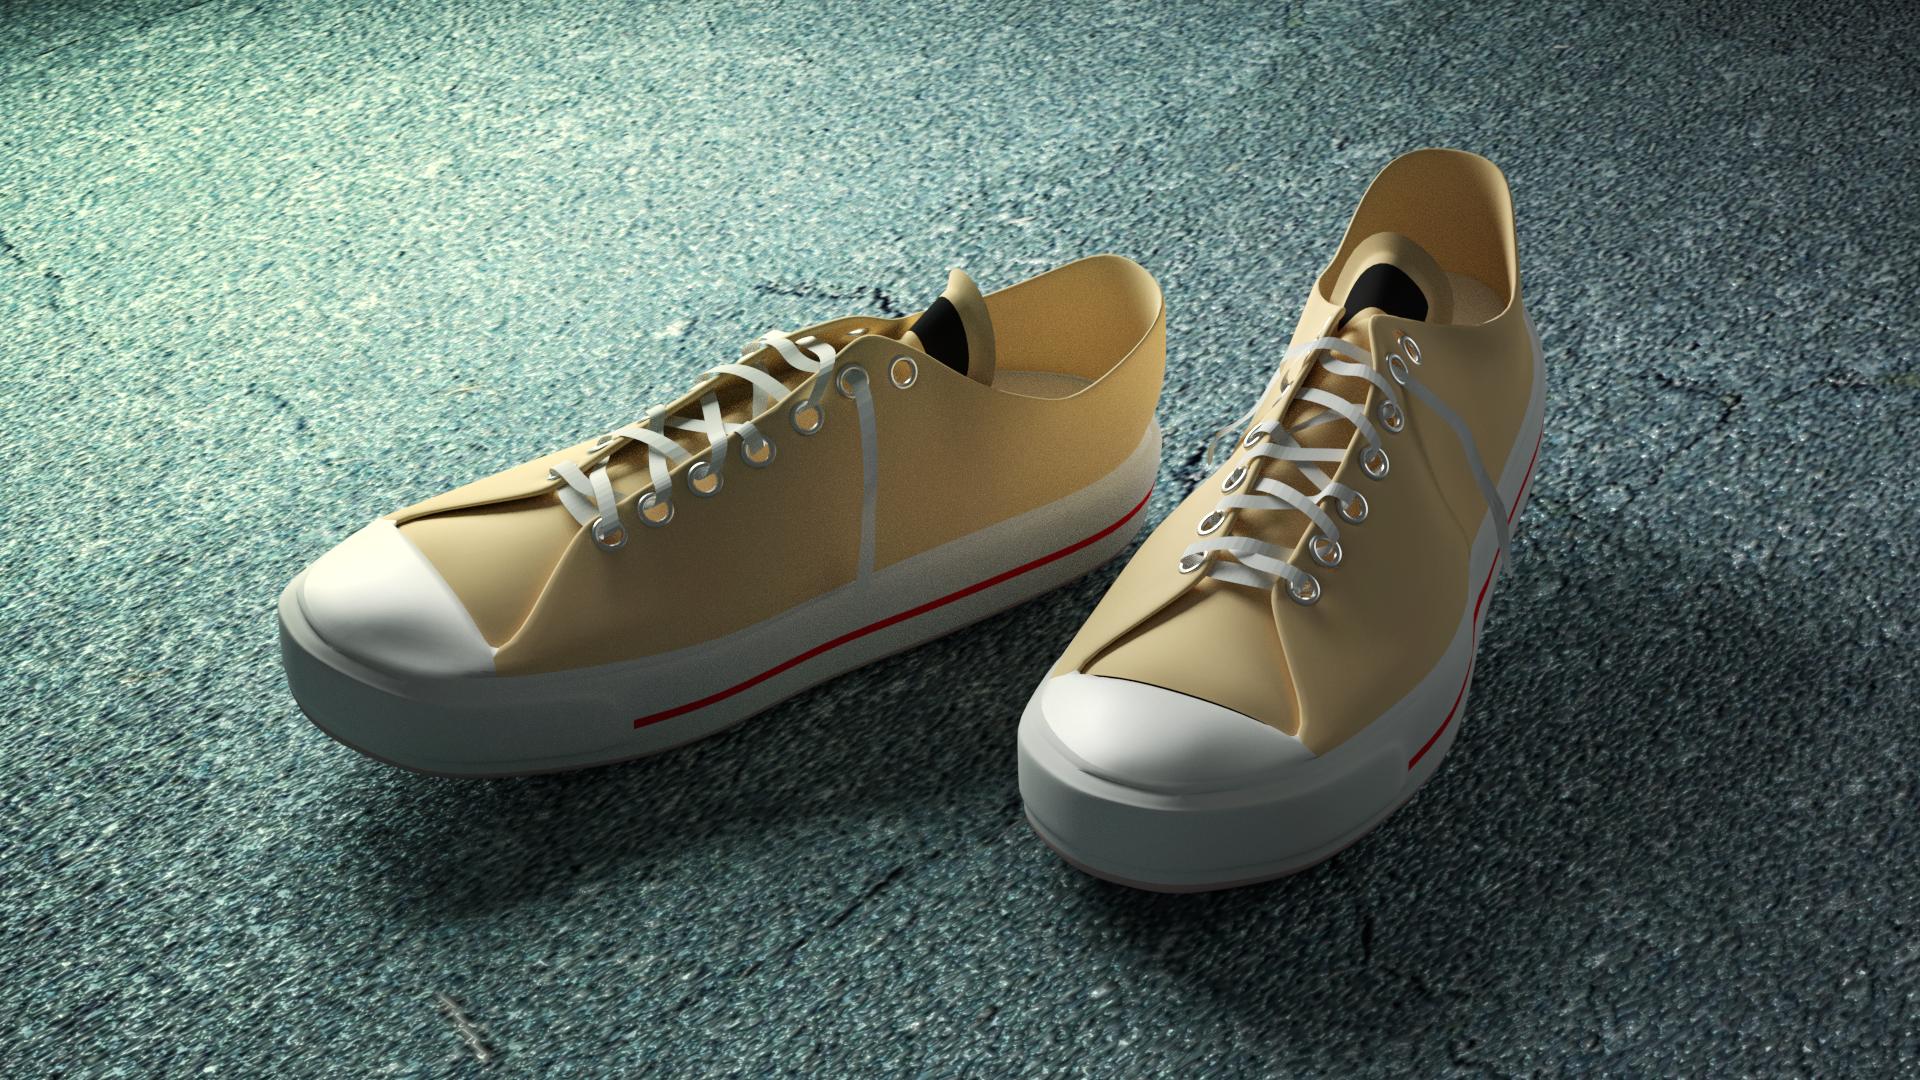 blenderで靴のコンバースを作成